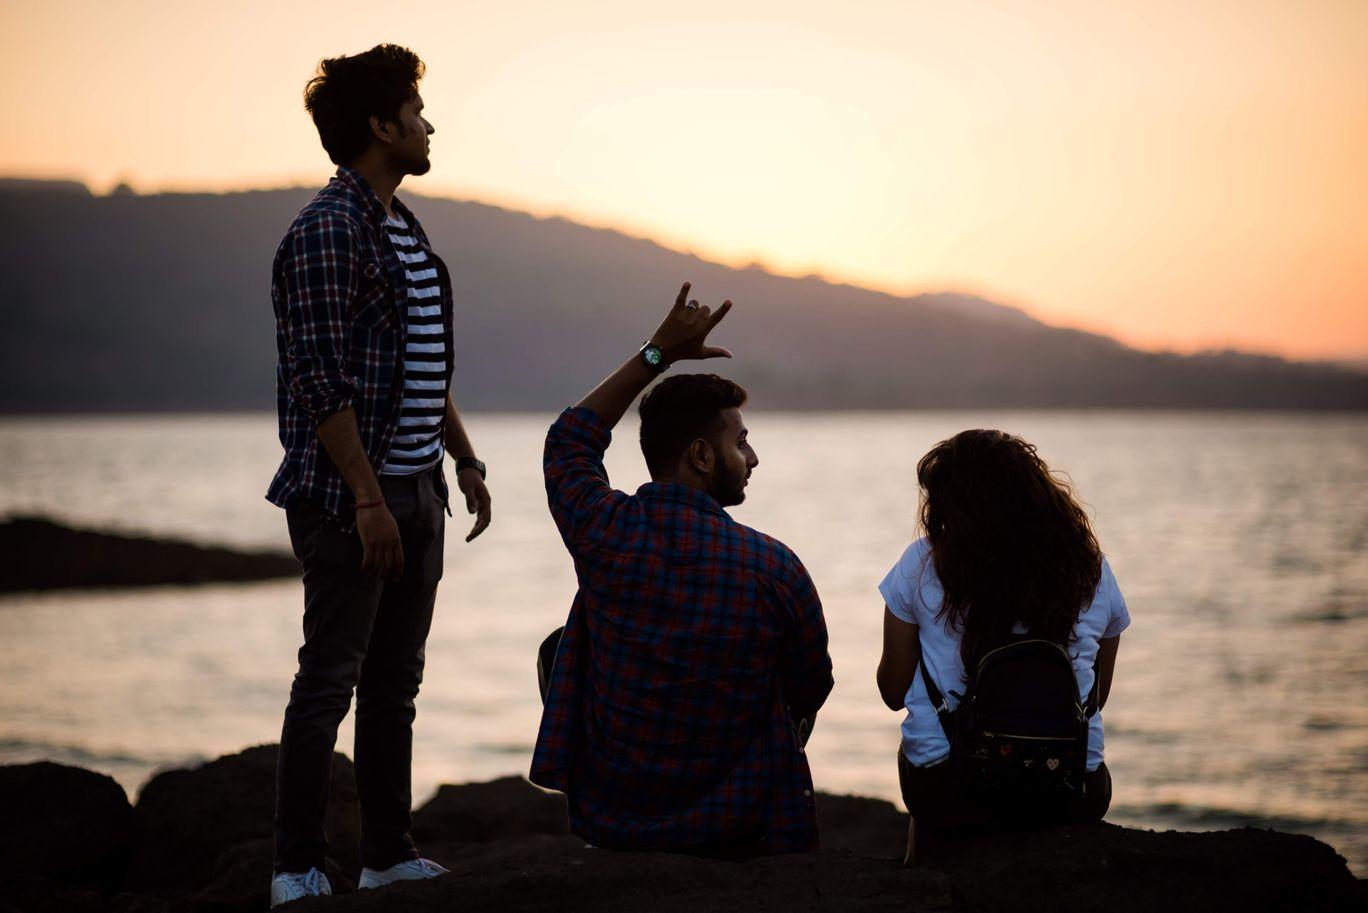 Photo of Pawna lake Camping Lonavala - MakeMyCamping By Deeksha Gubreley